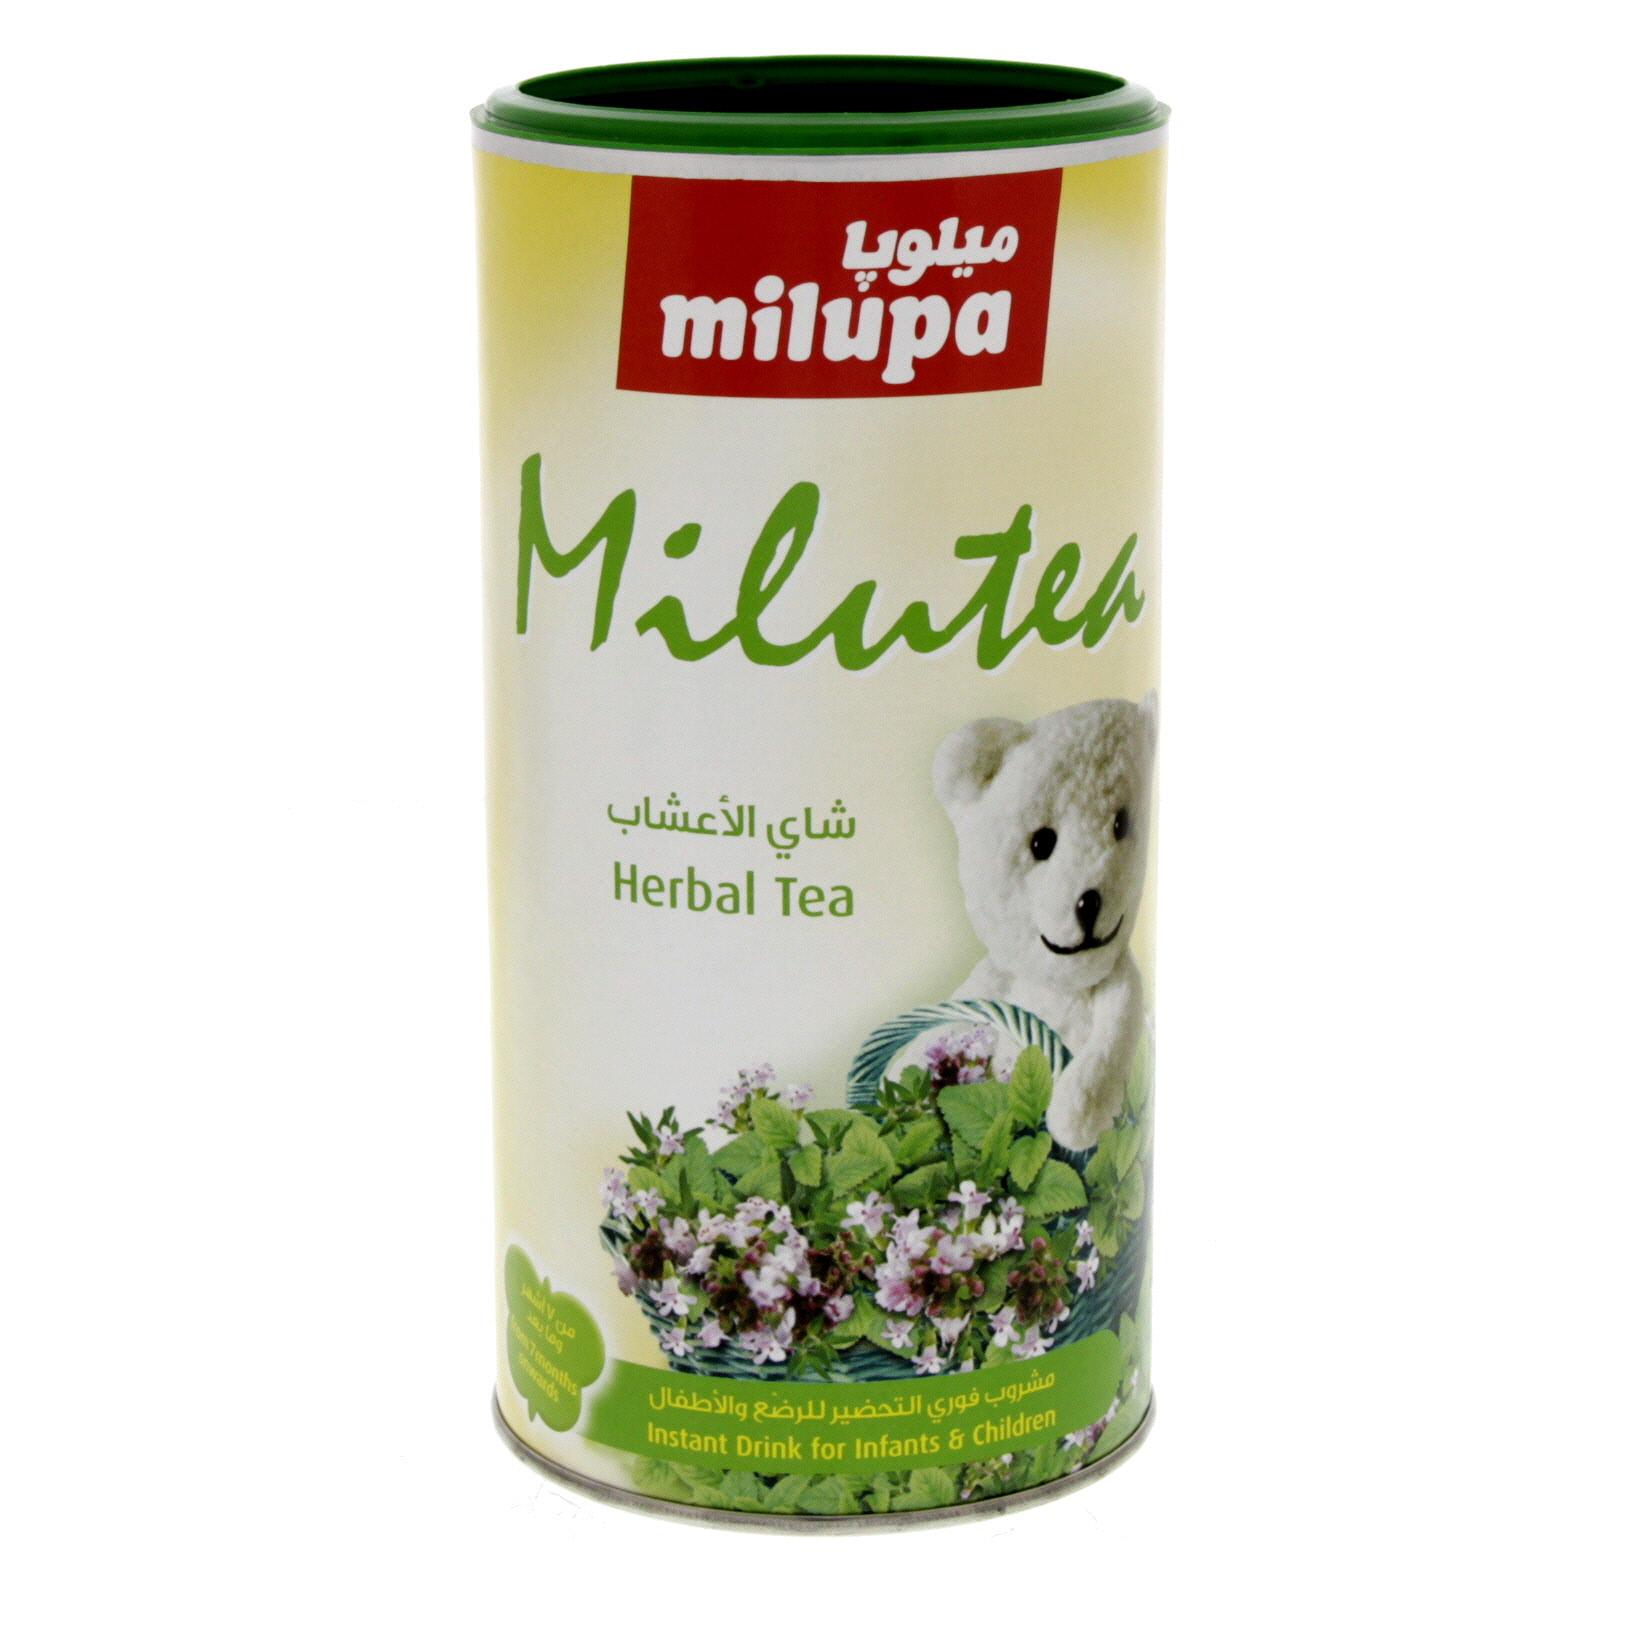 Tarifa Tugovati Spaliti شاي الاطفال Herbandedi Org